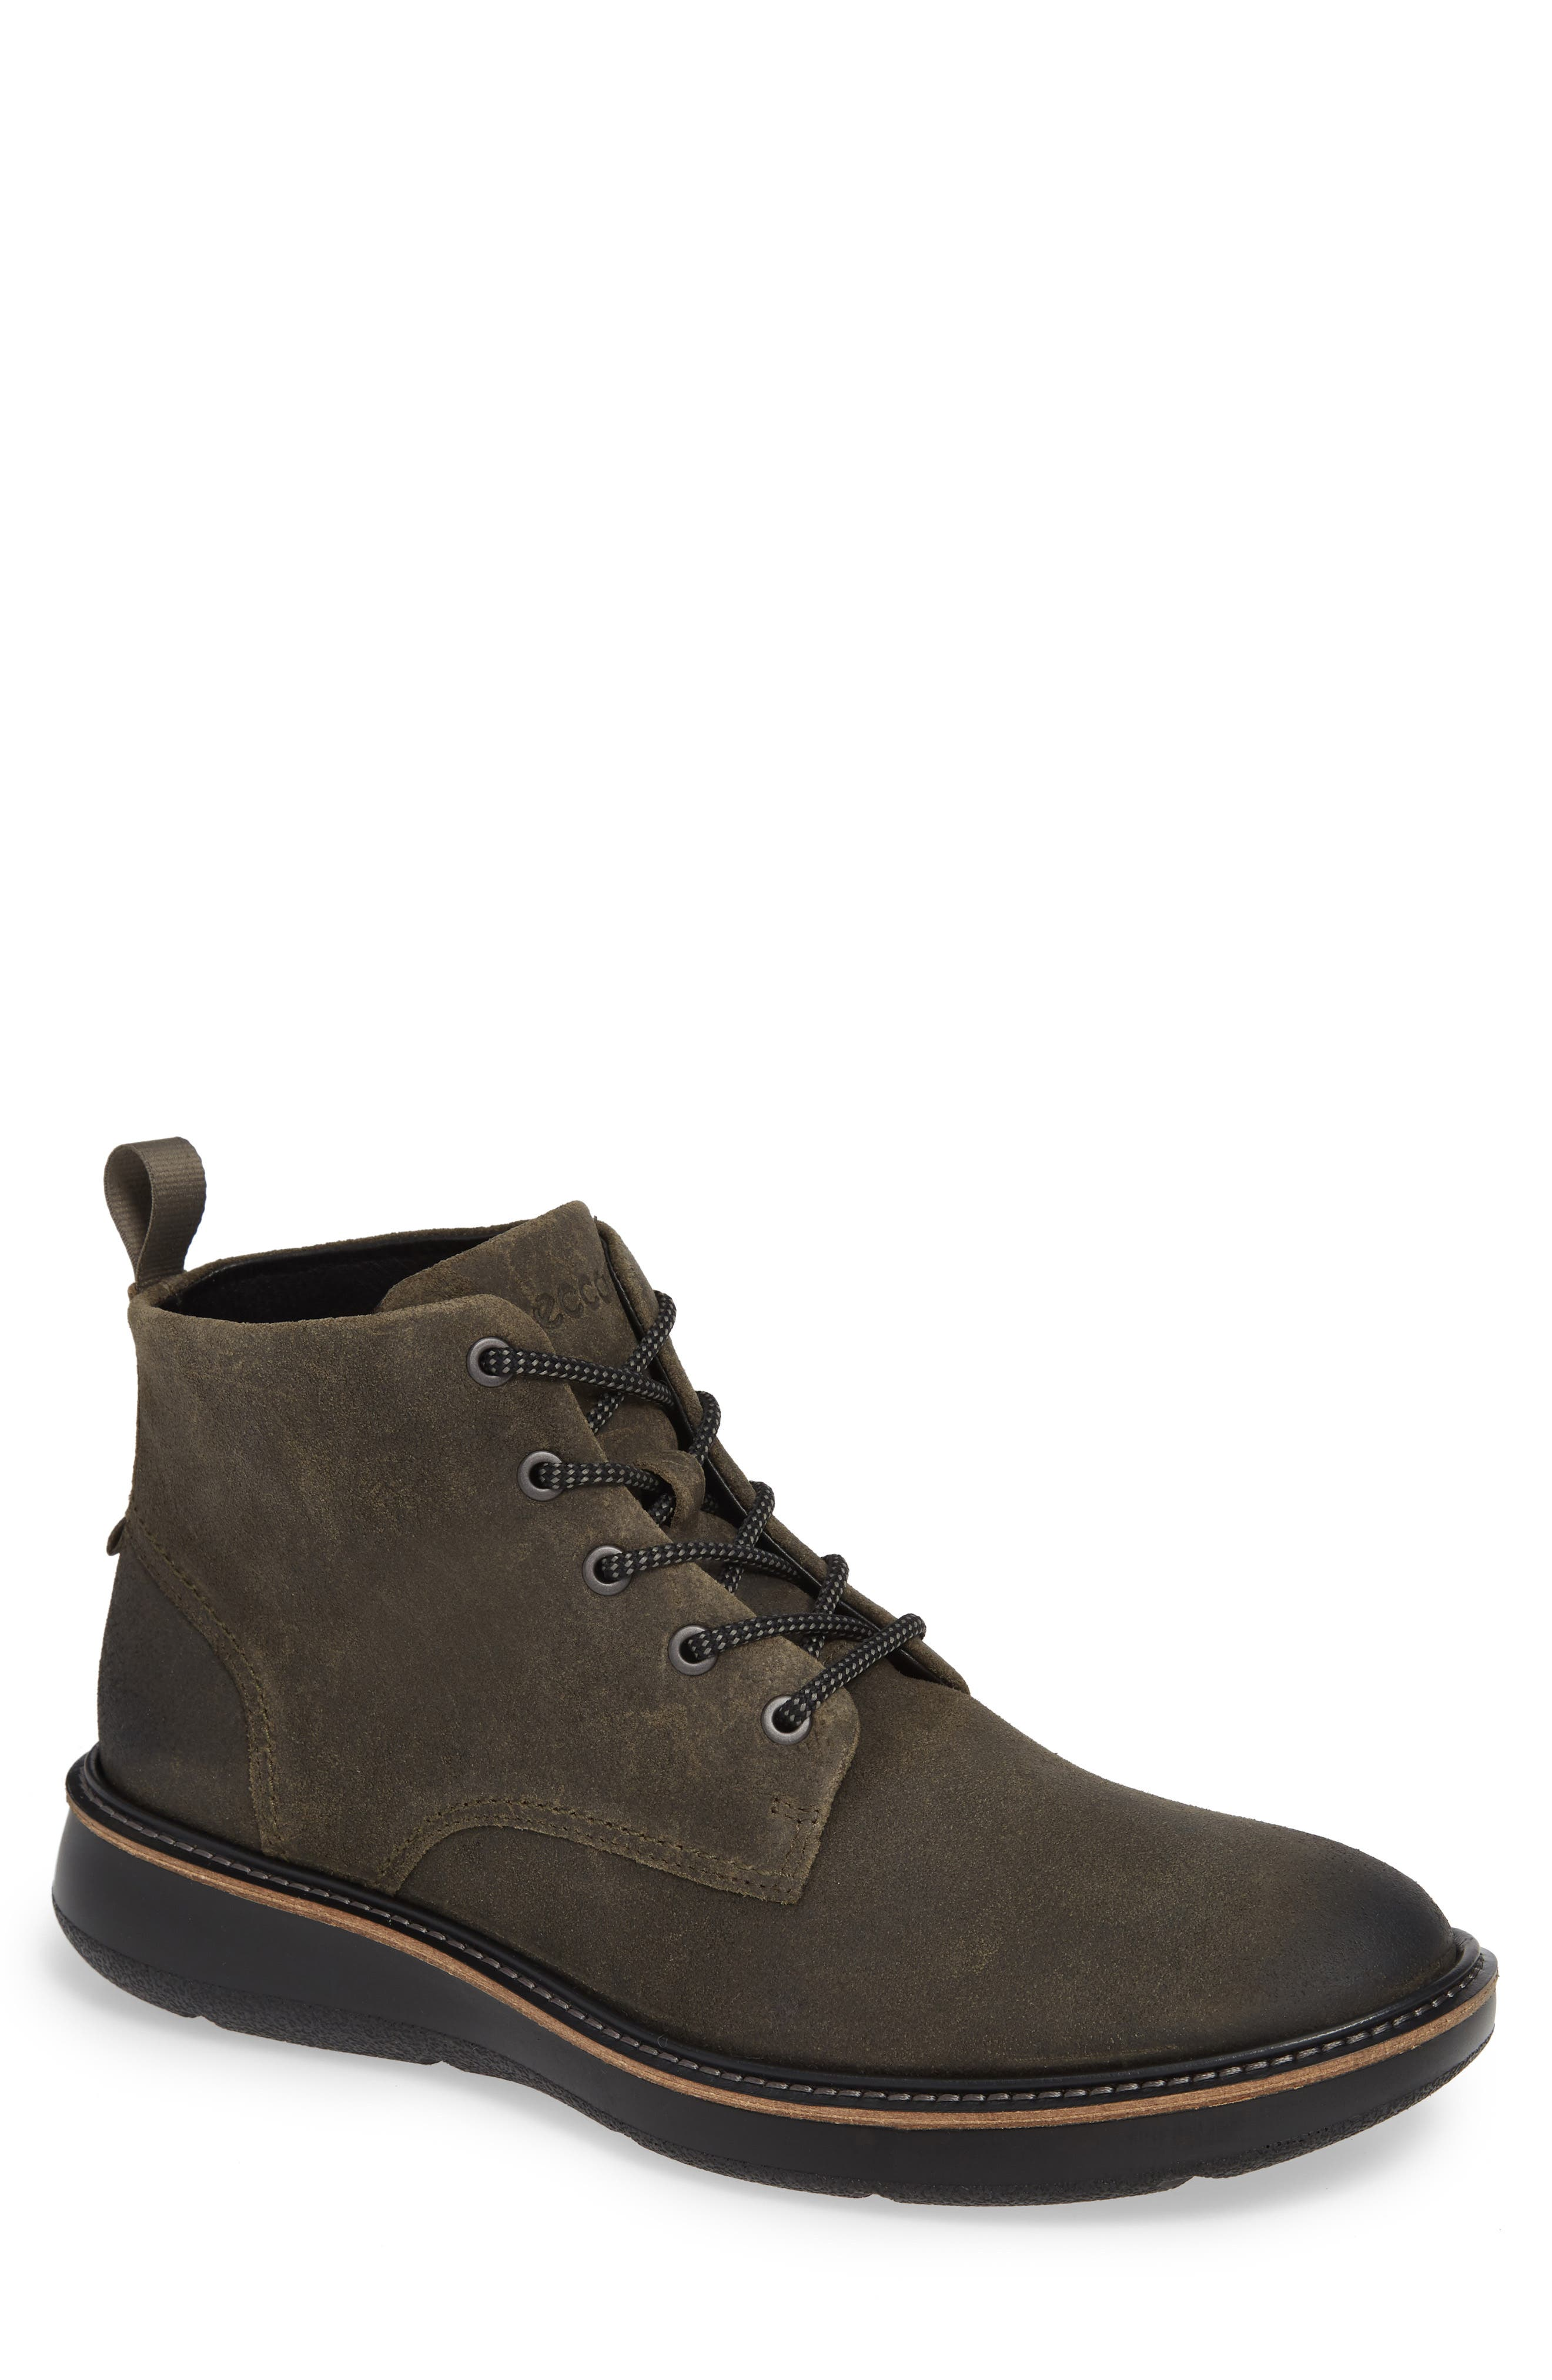 95b4d05e406e Ecco Aurora Plain Toe Boot